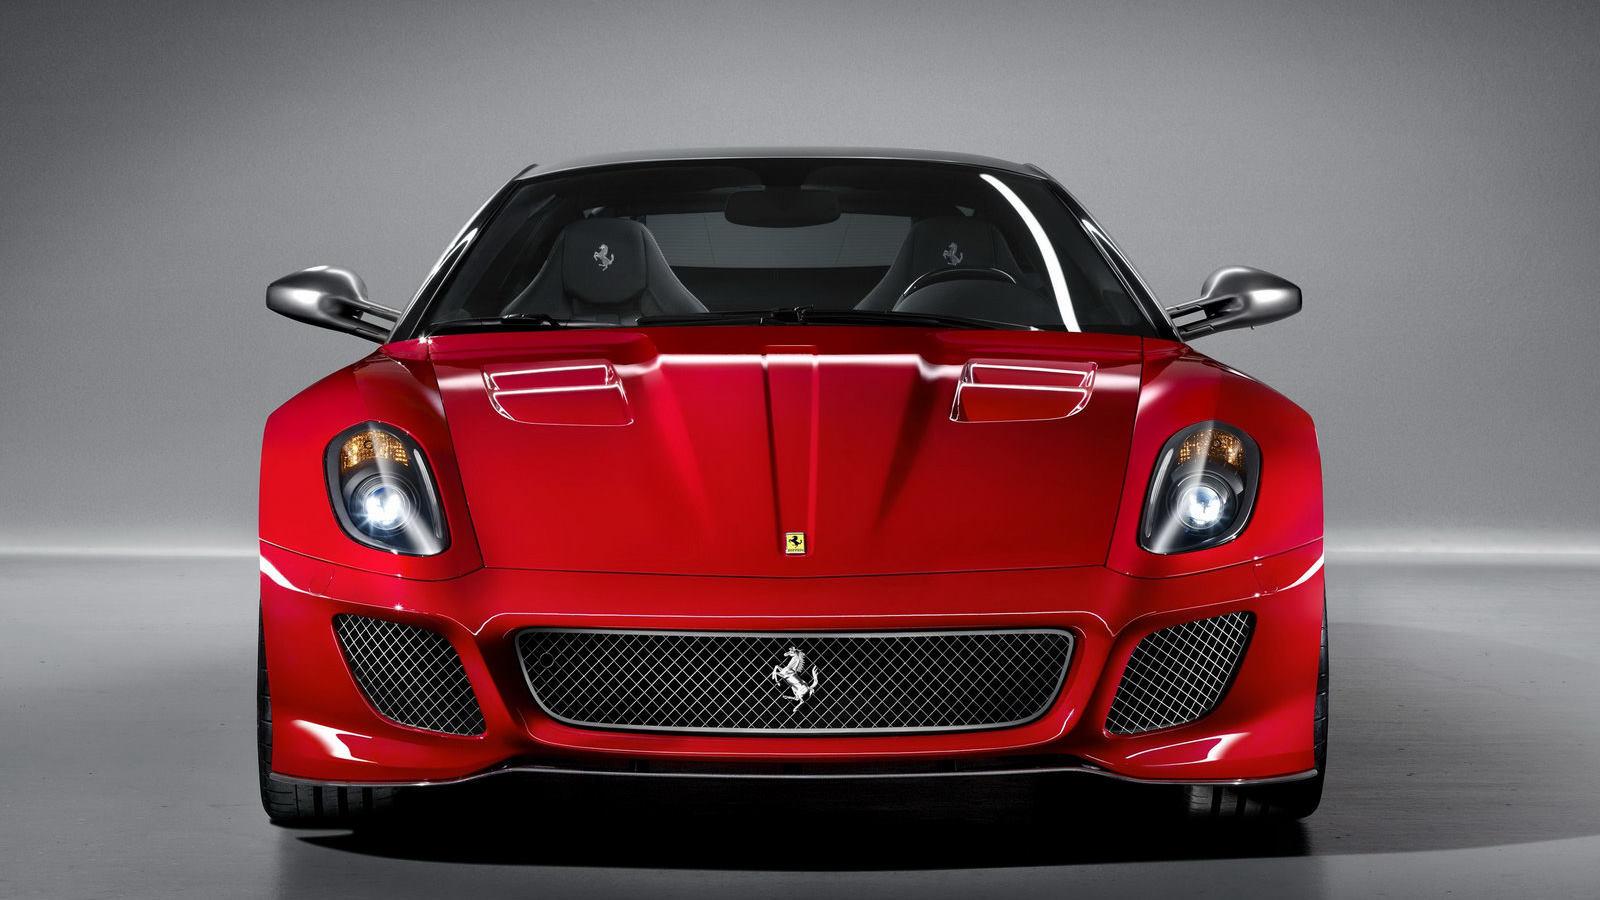 http://1.bp.blogspot.com/-nA5_cf3TsKE/TwrheMoLsJI/AAAAAAAAAZw/g8con84nVjw/s1600/Ferrari-599-Wallpaper-HD.jpg